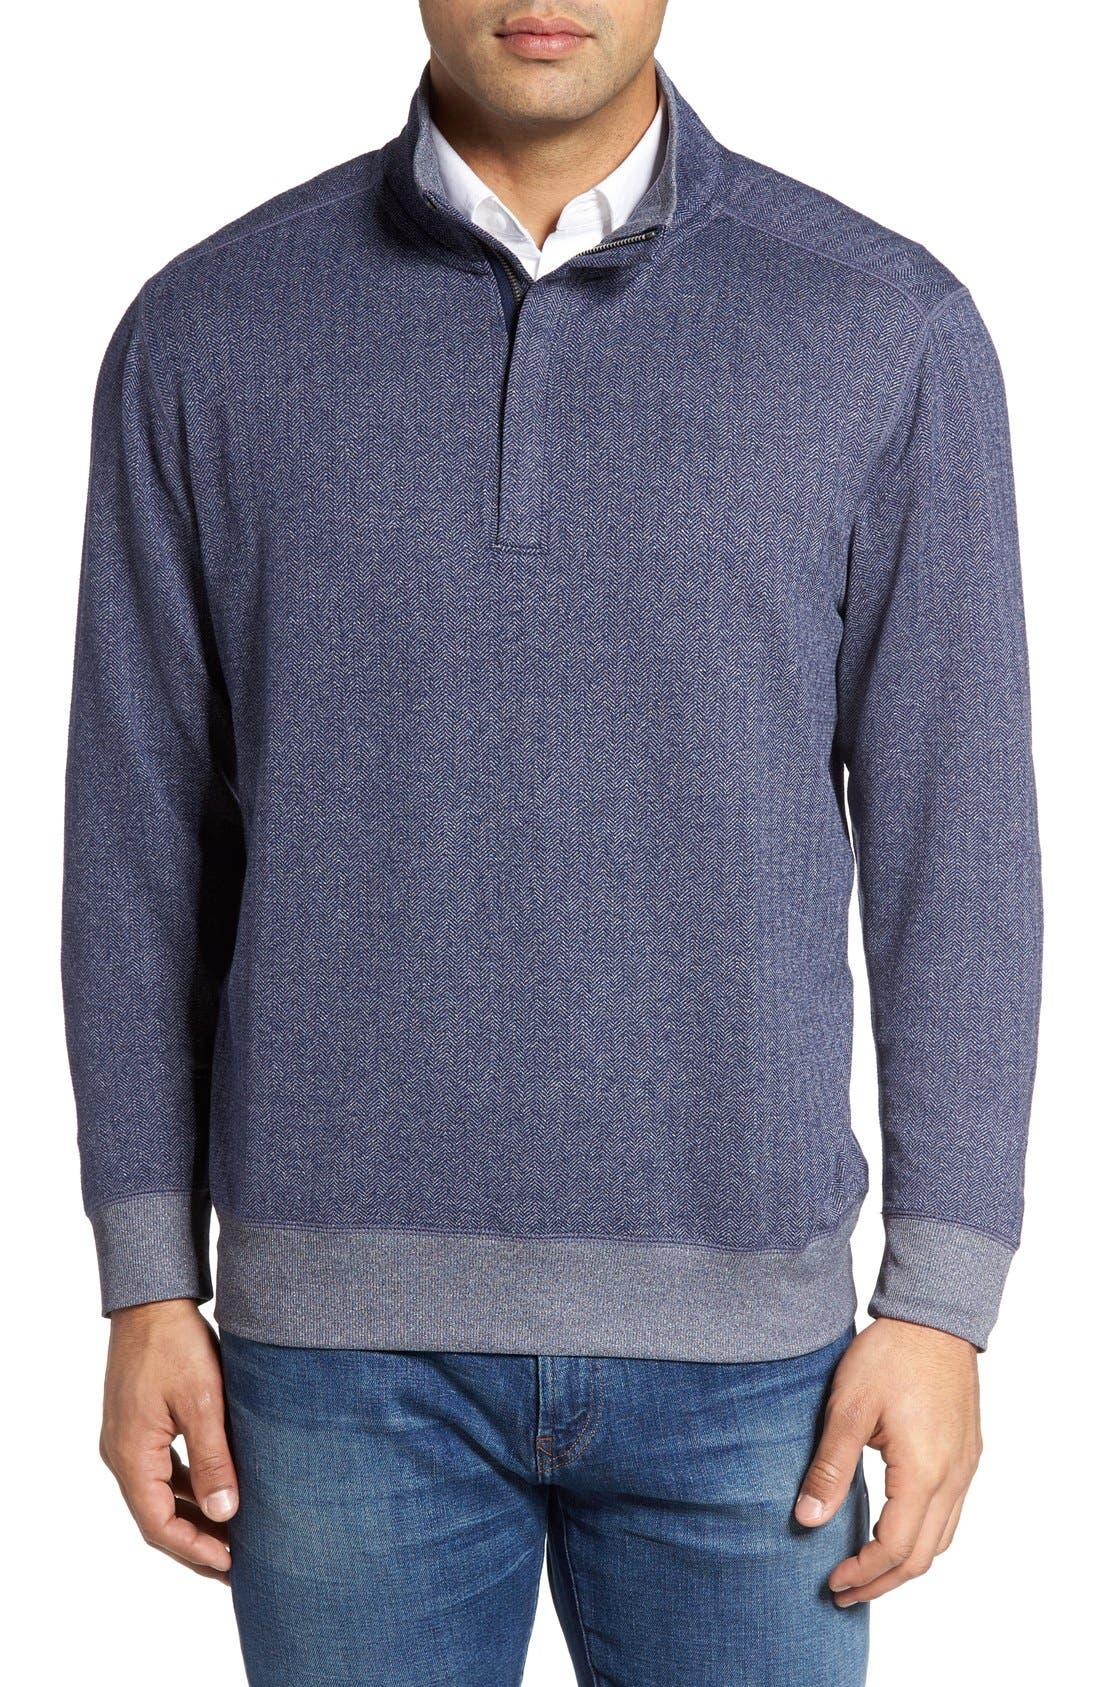 Pro Formance Quarter Zip Sweater,                             Main thumbnail 1, color,                             Blue Note Heather